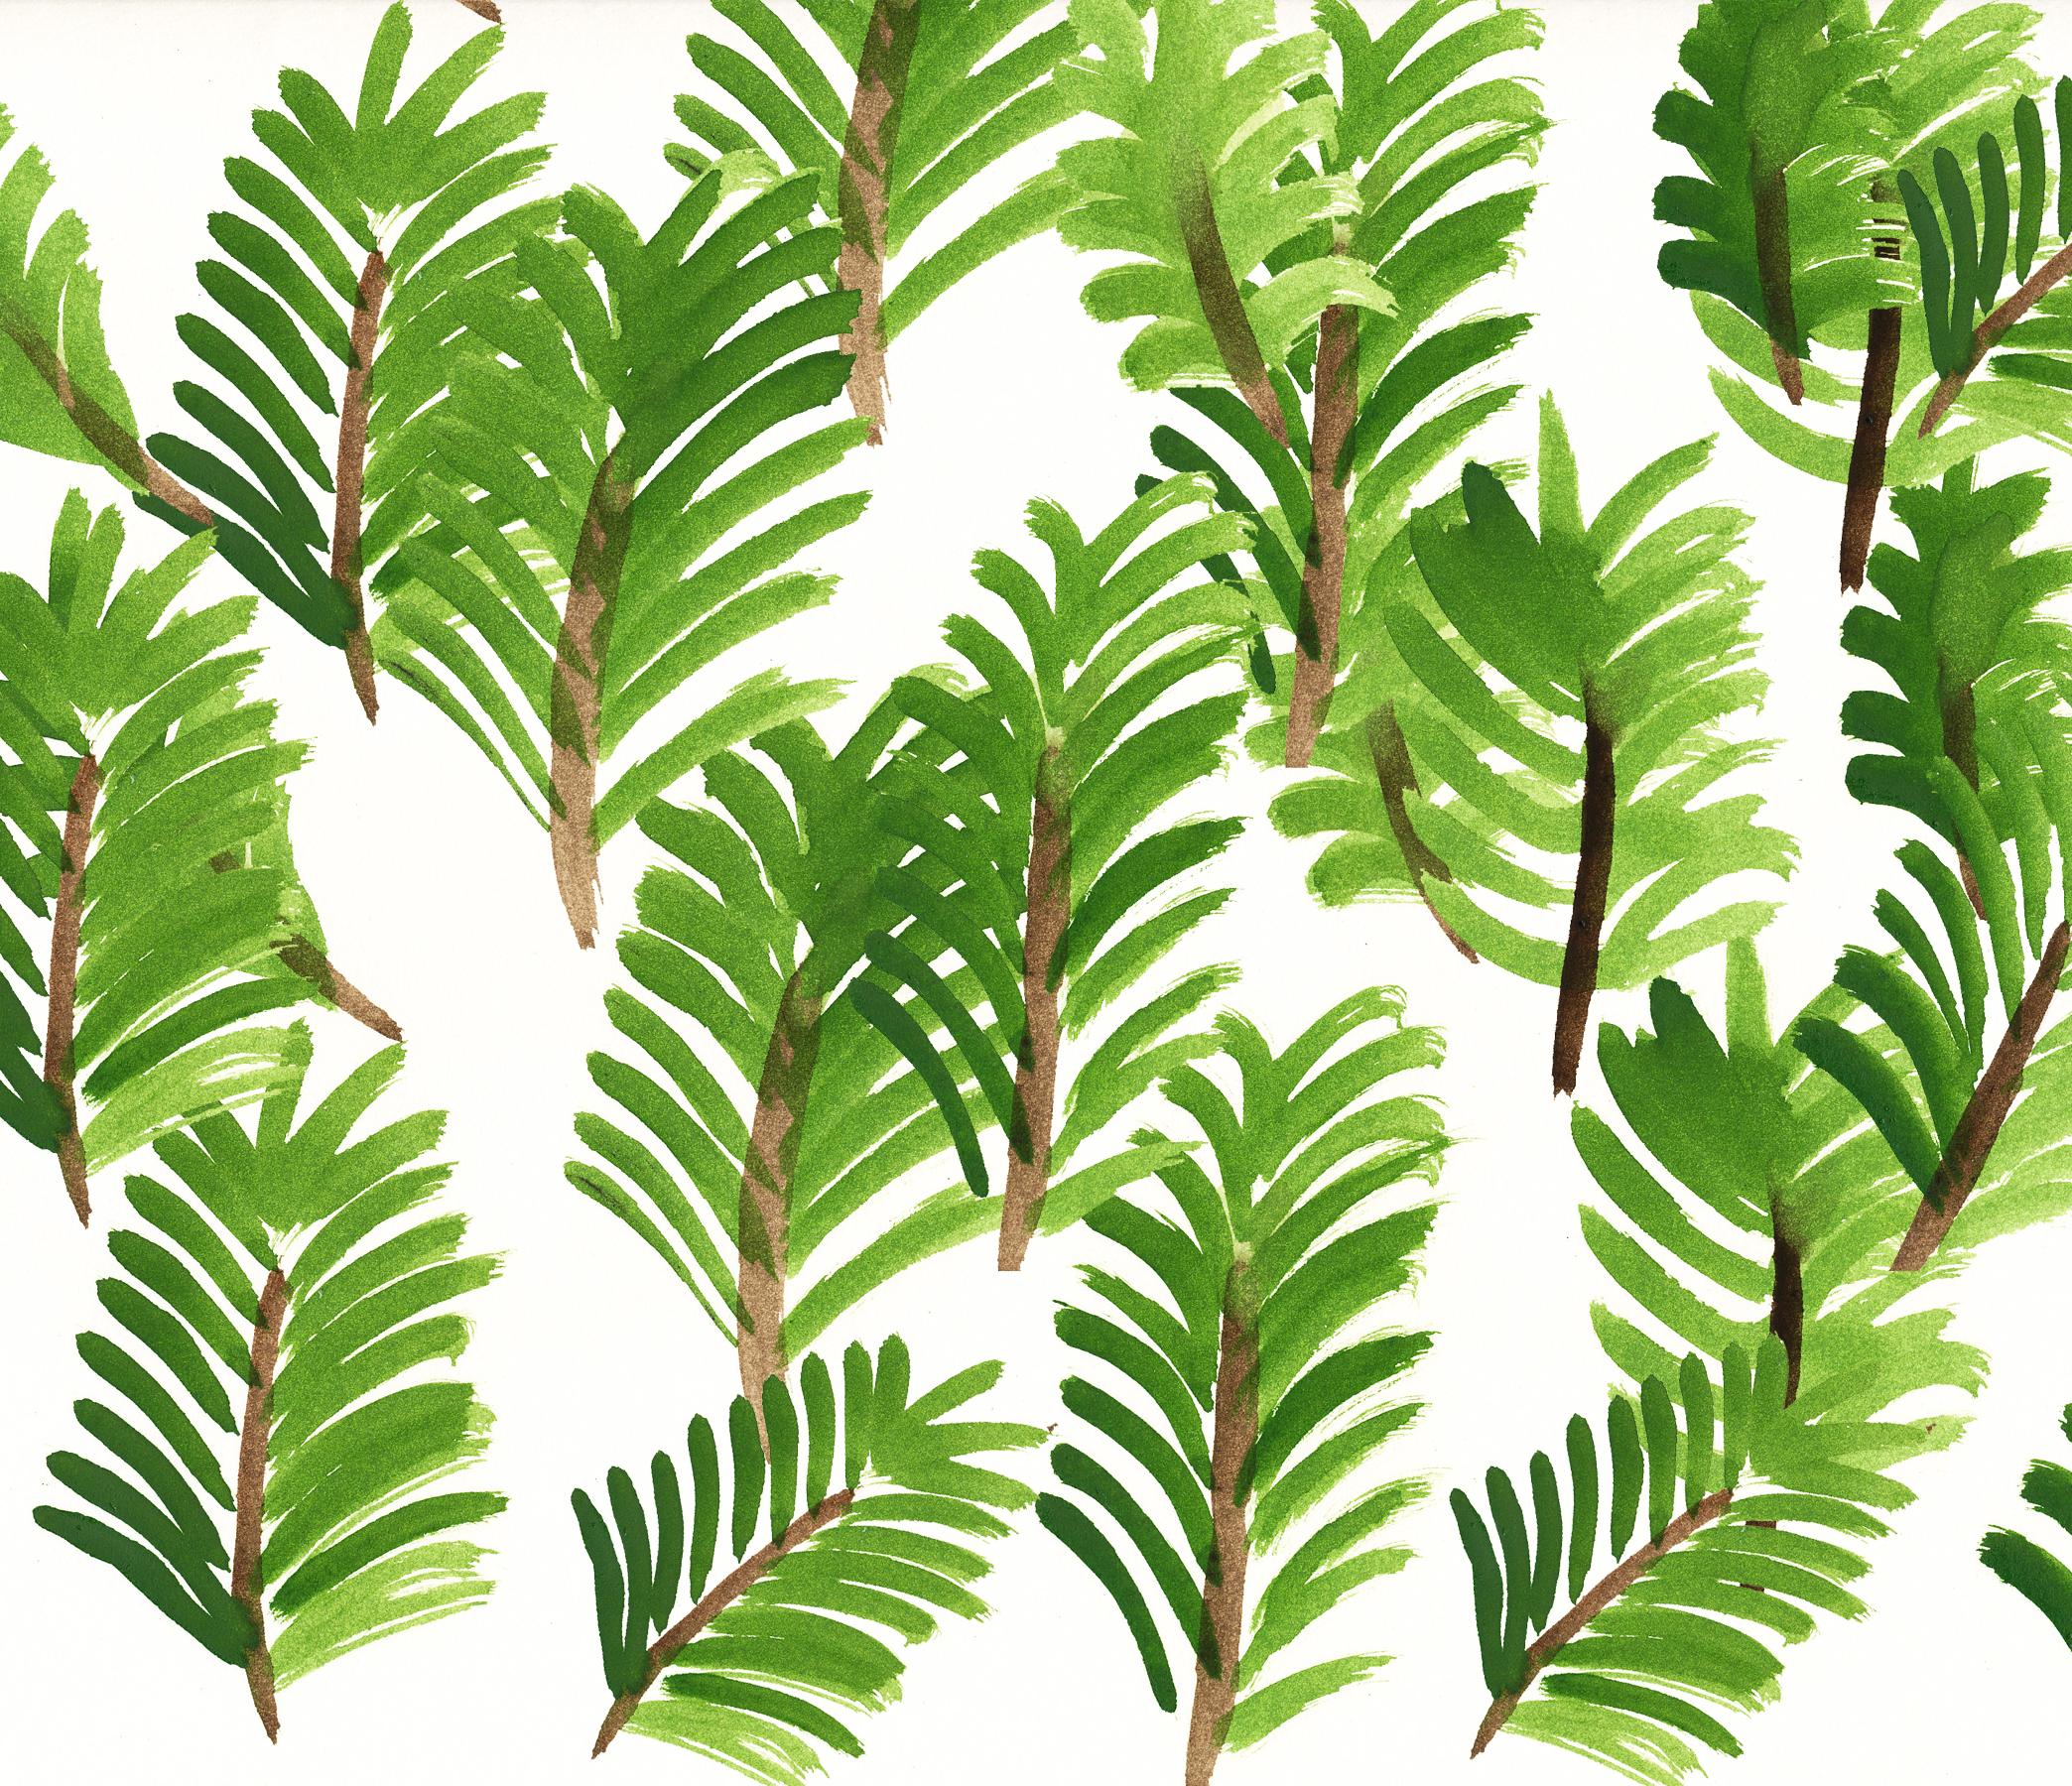 Design pflanzen wallpaper f r mai pixi mit milch for Design pflanzen